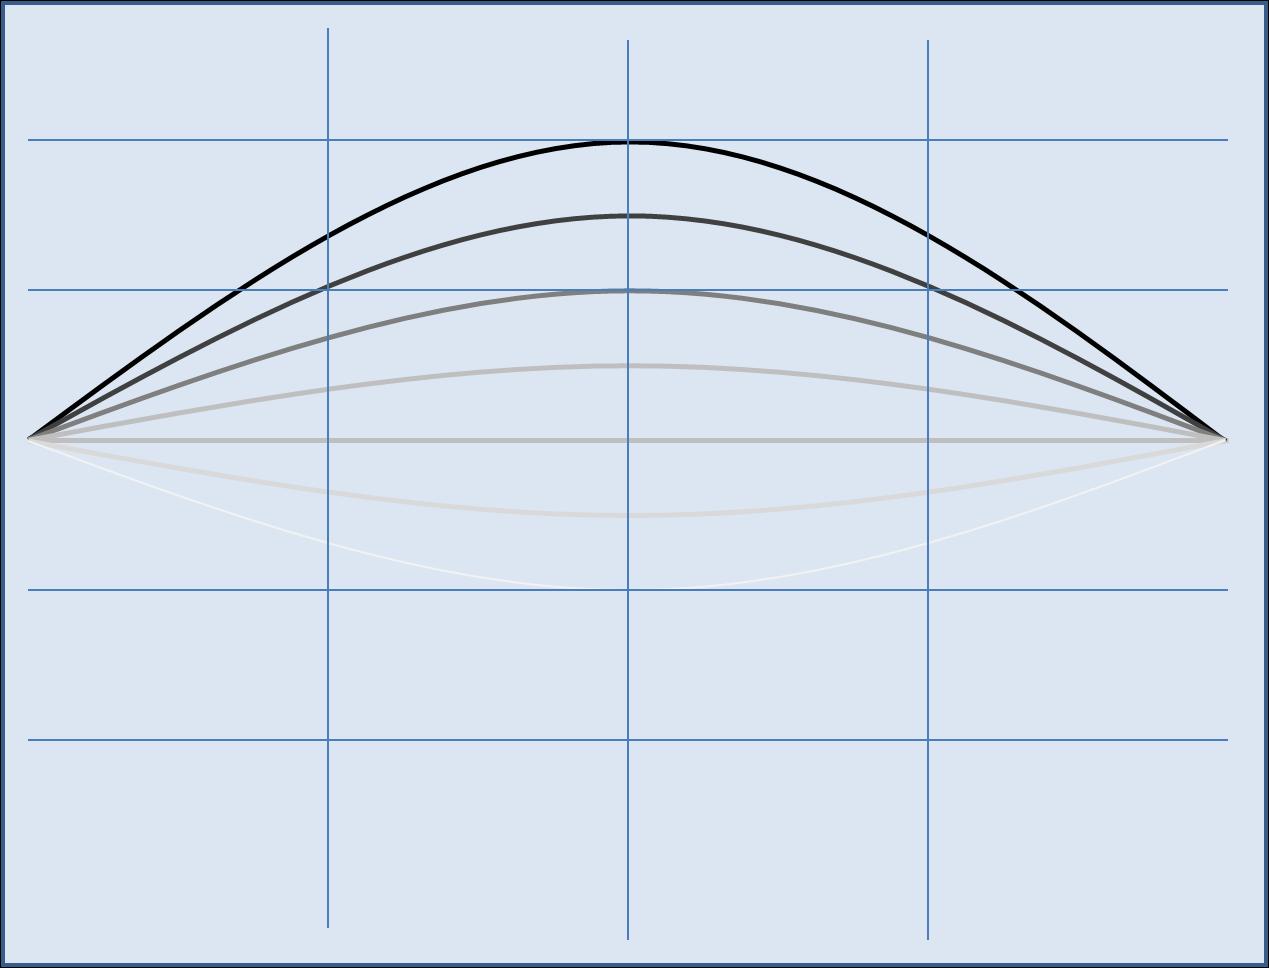 piano wire diagram [ 1269 x 968 Pixel ]